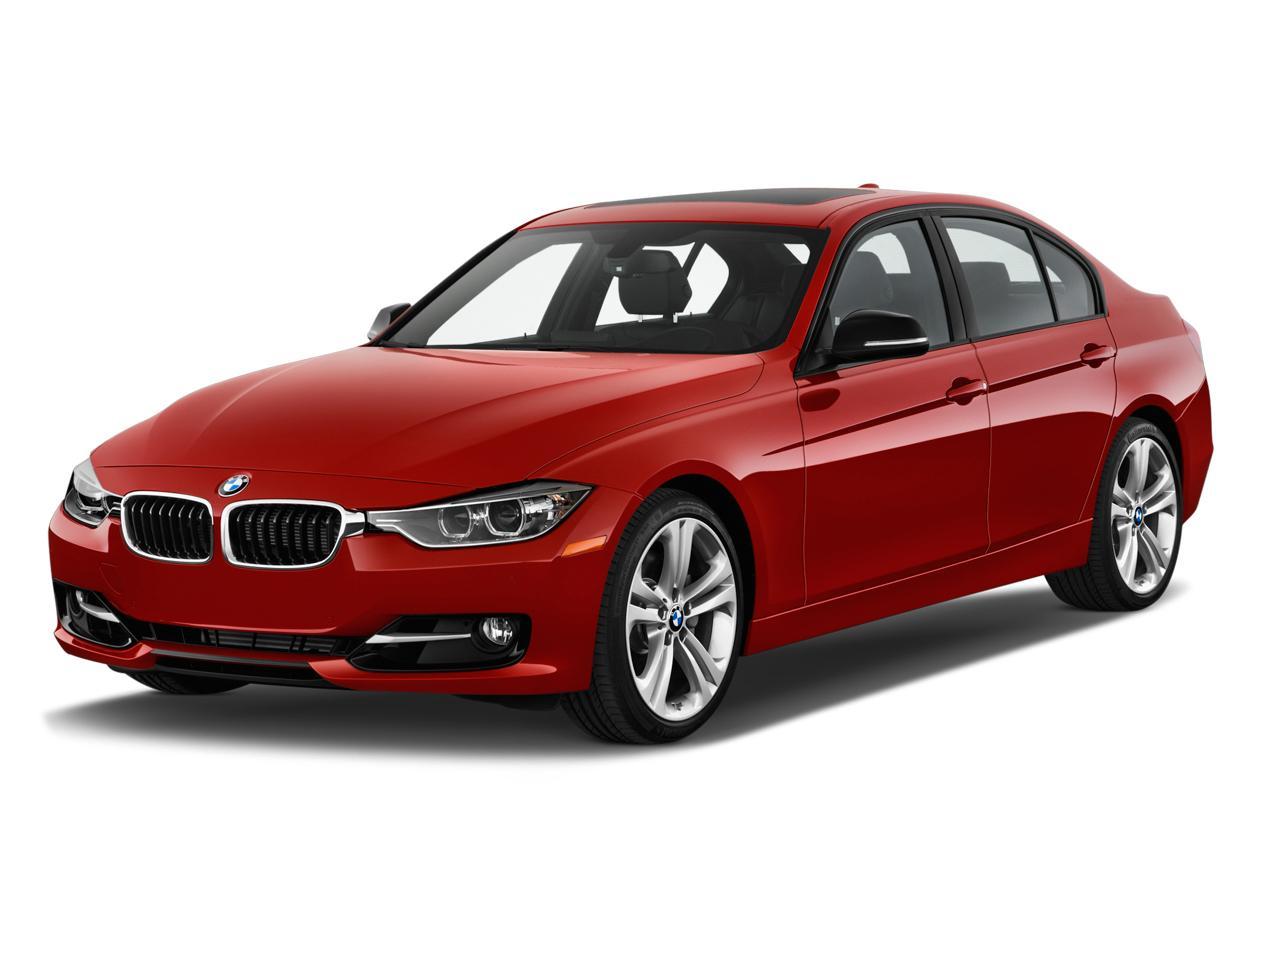 BMW 3-Series (E90/E91/E92/E93) 335i, 335is, 335xi, 335d ...